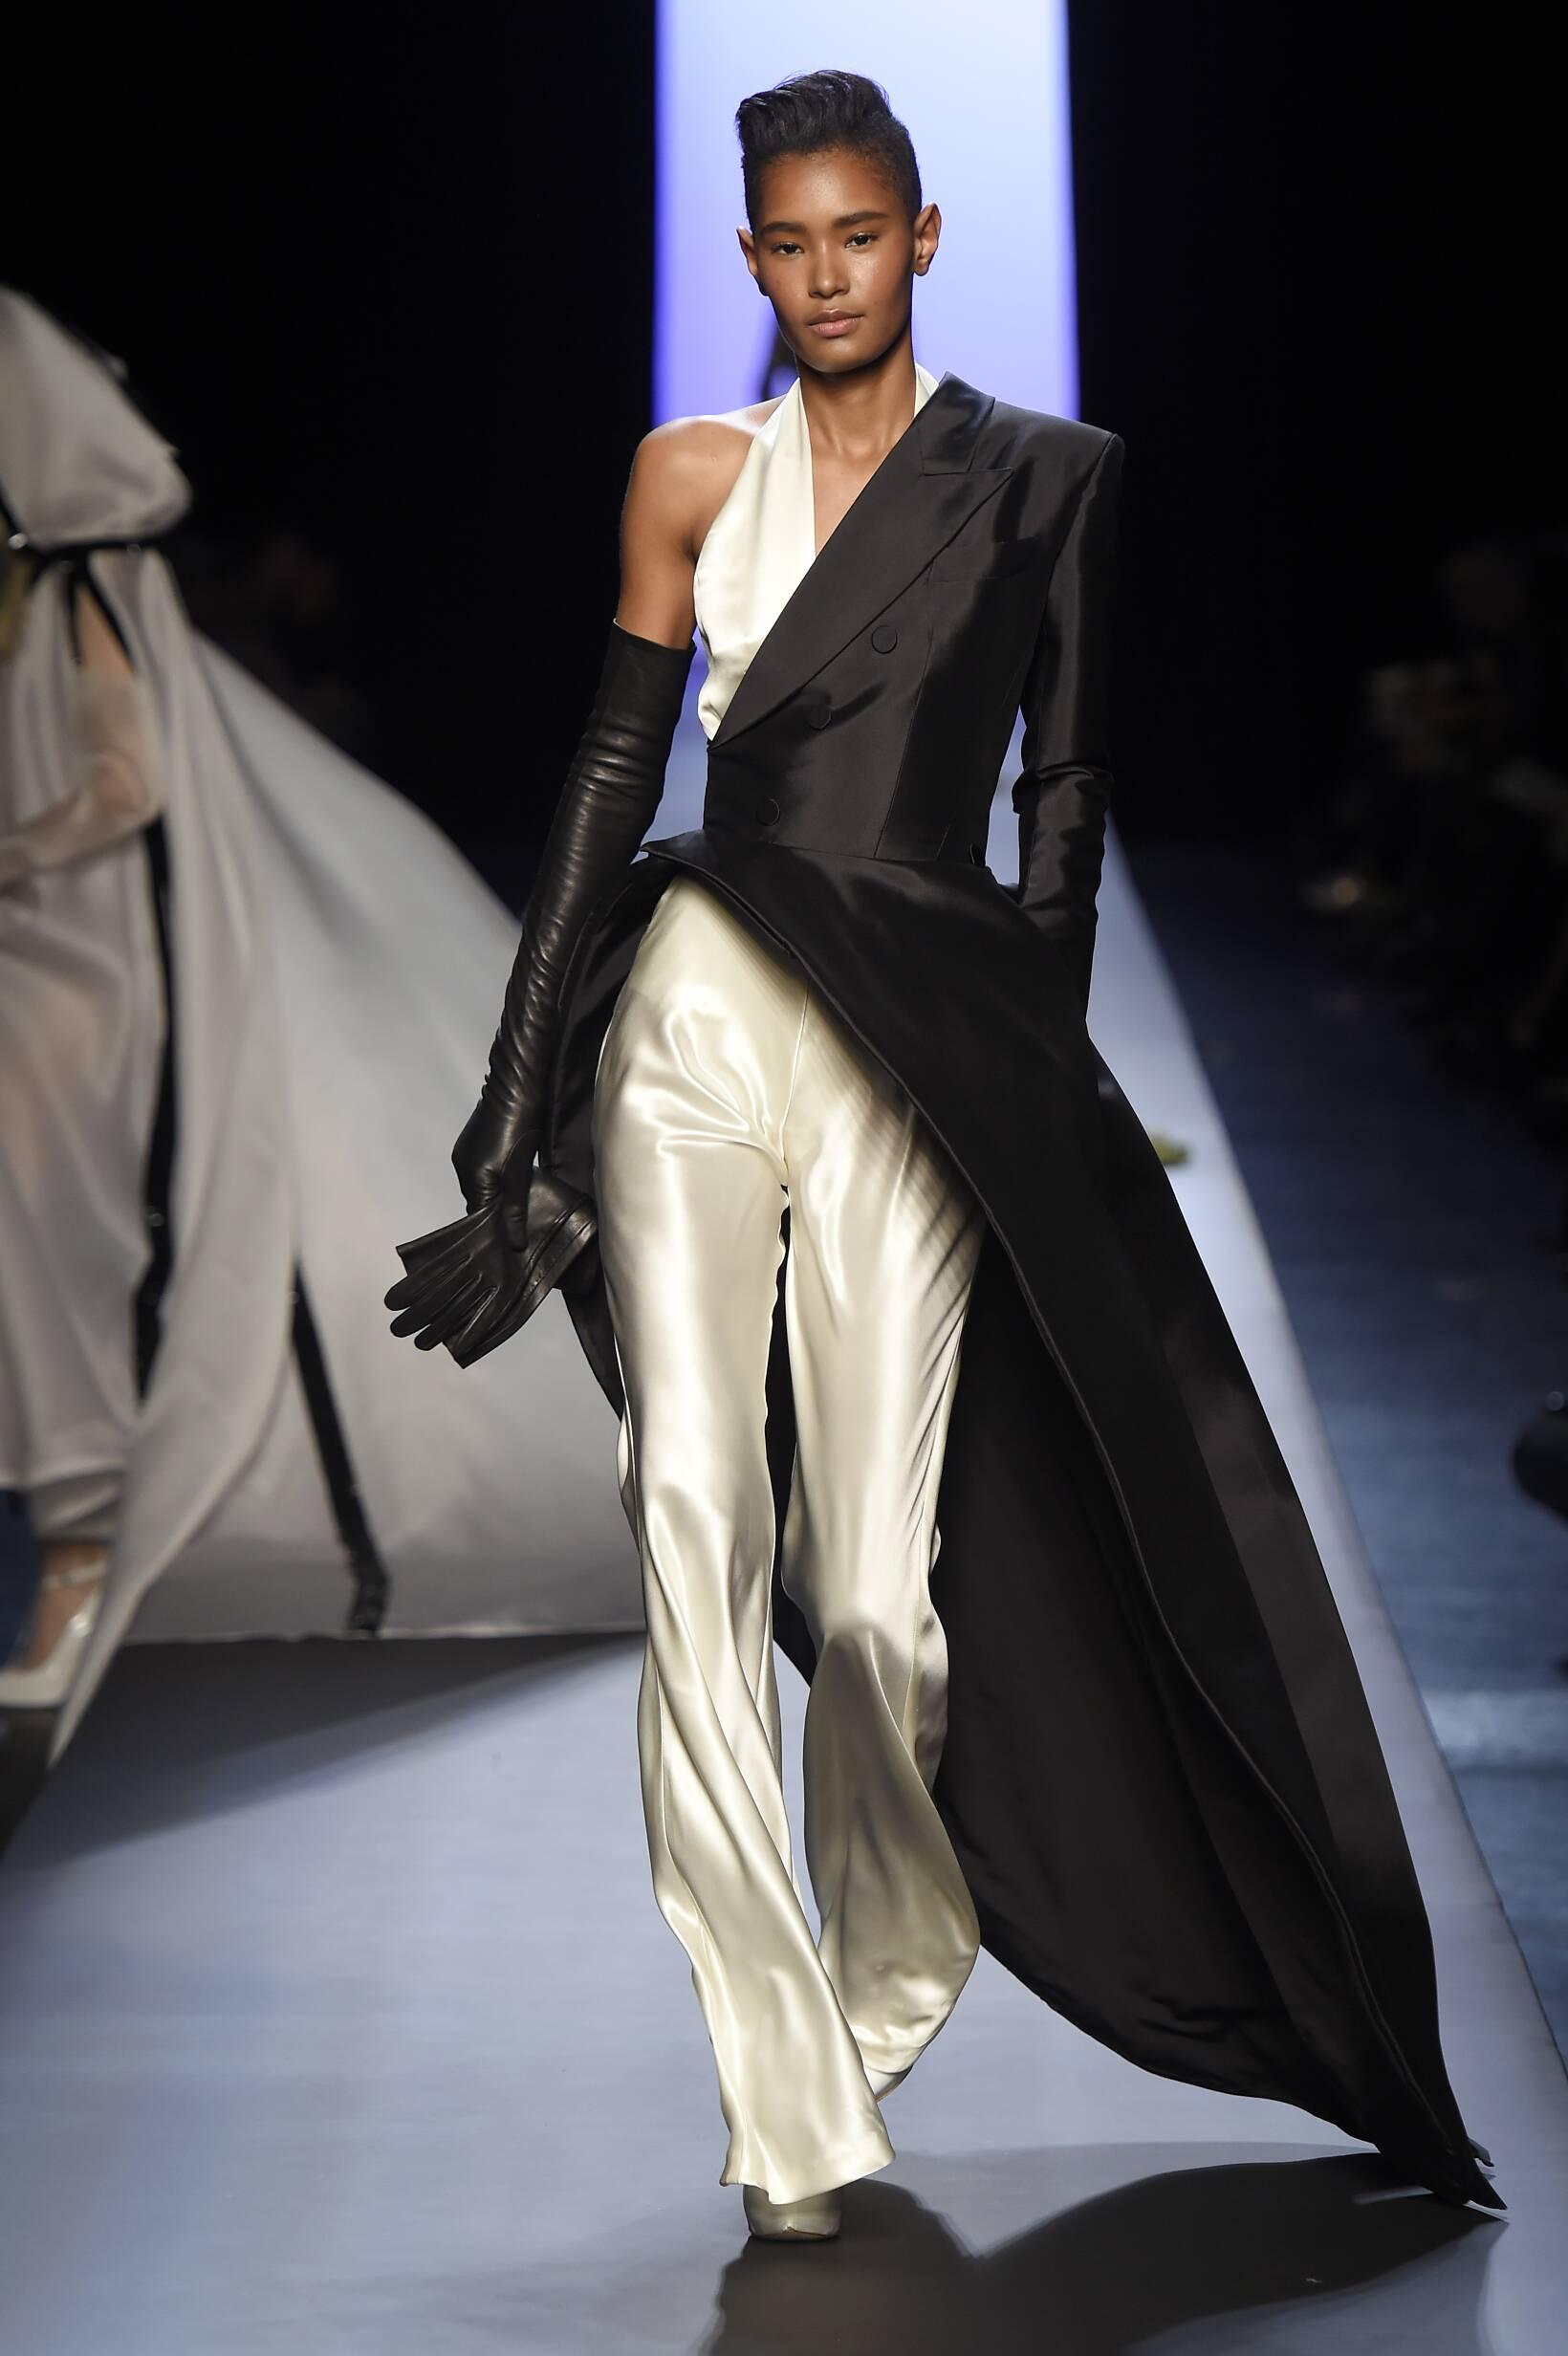 Jean Paul Gaultier Haute Couture Spring Summer 2015 Women's Collection Paris Fashion Week